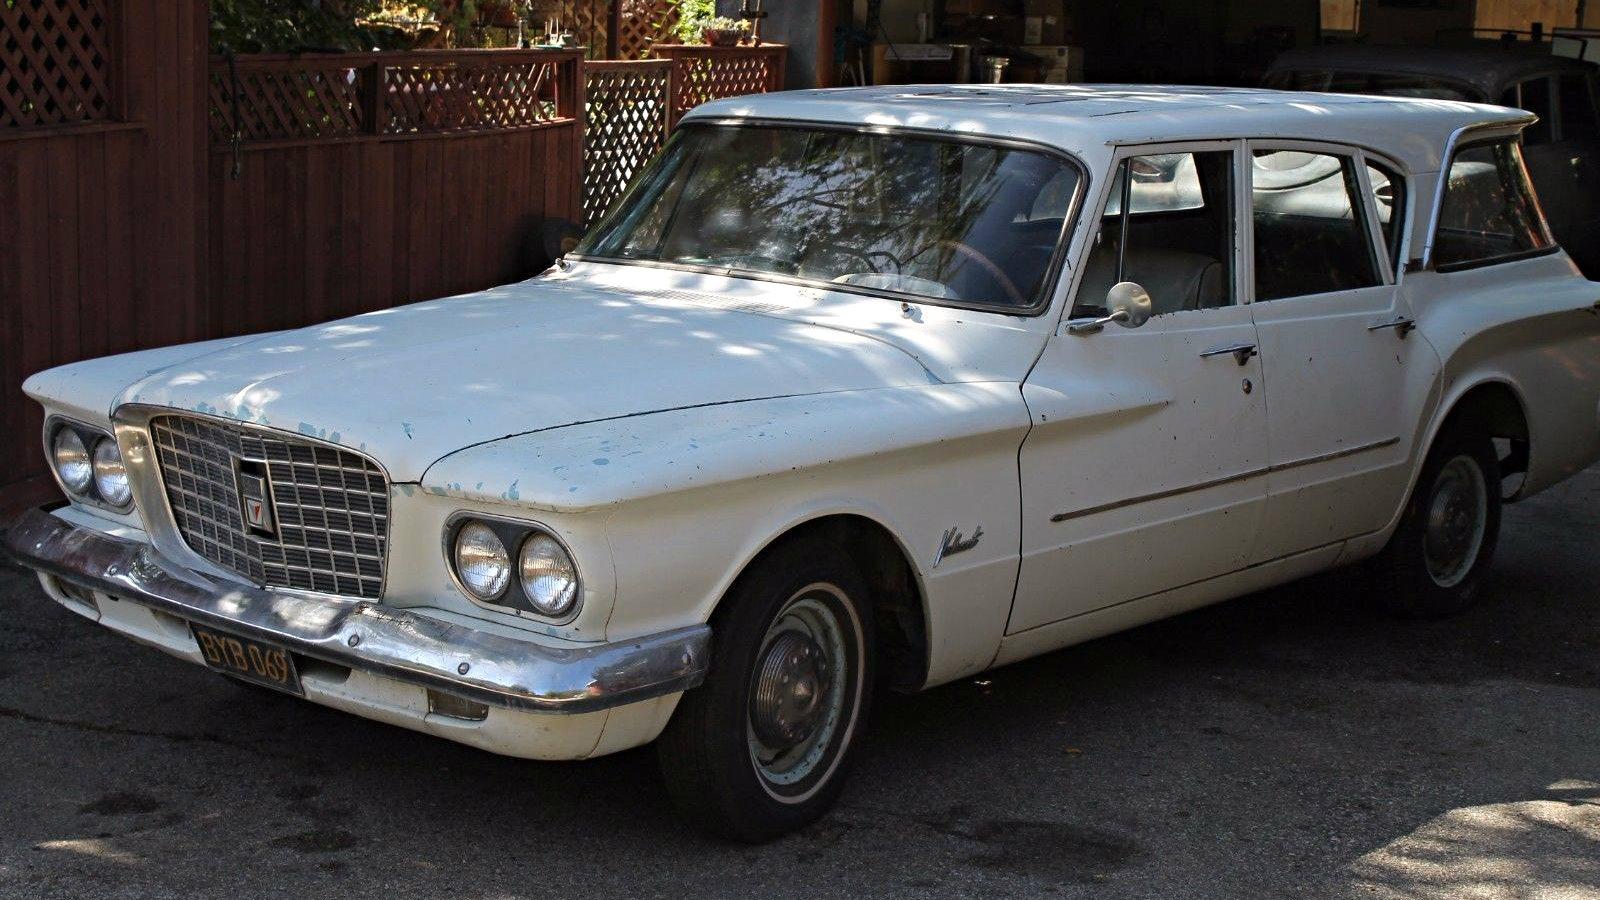 Well Loved Wagon 1961 Plymouth Valiant Wagon